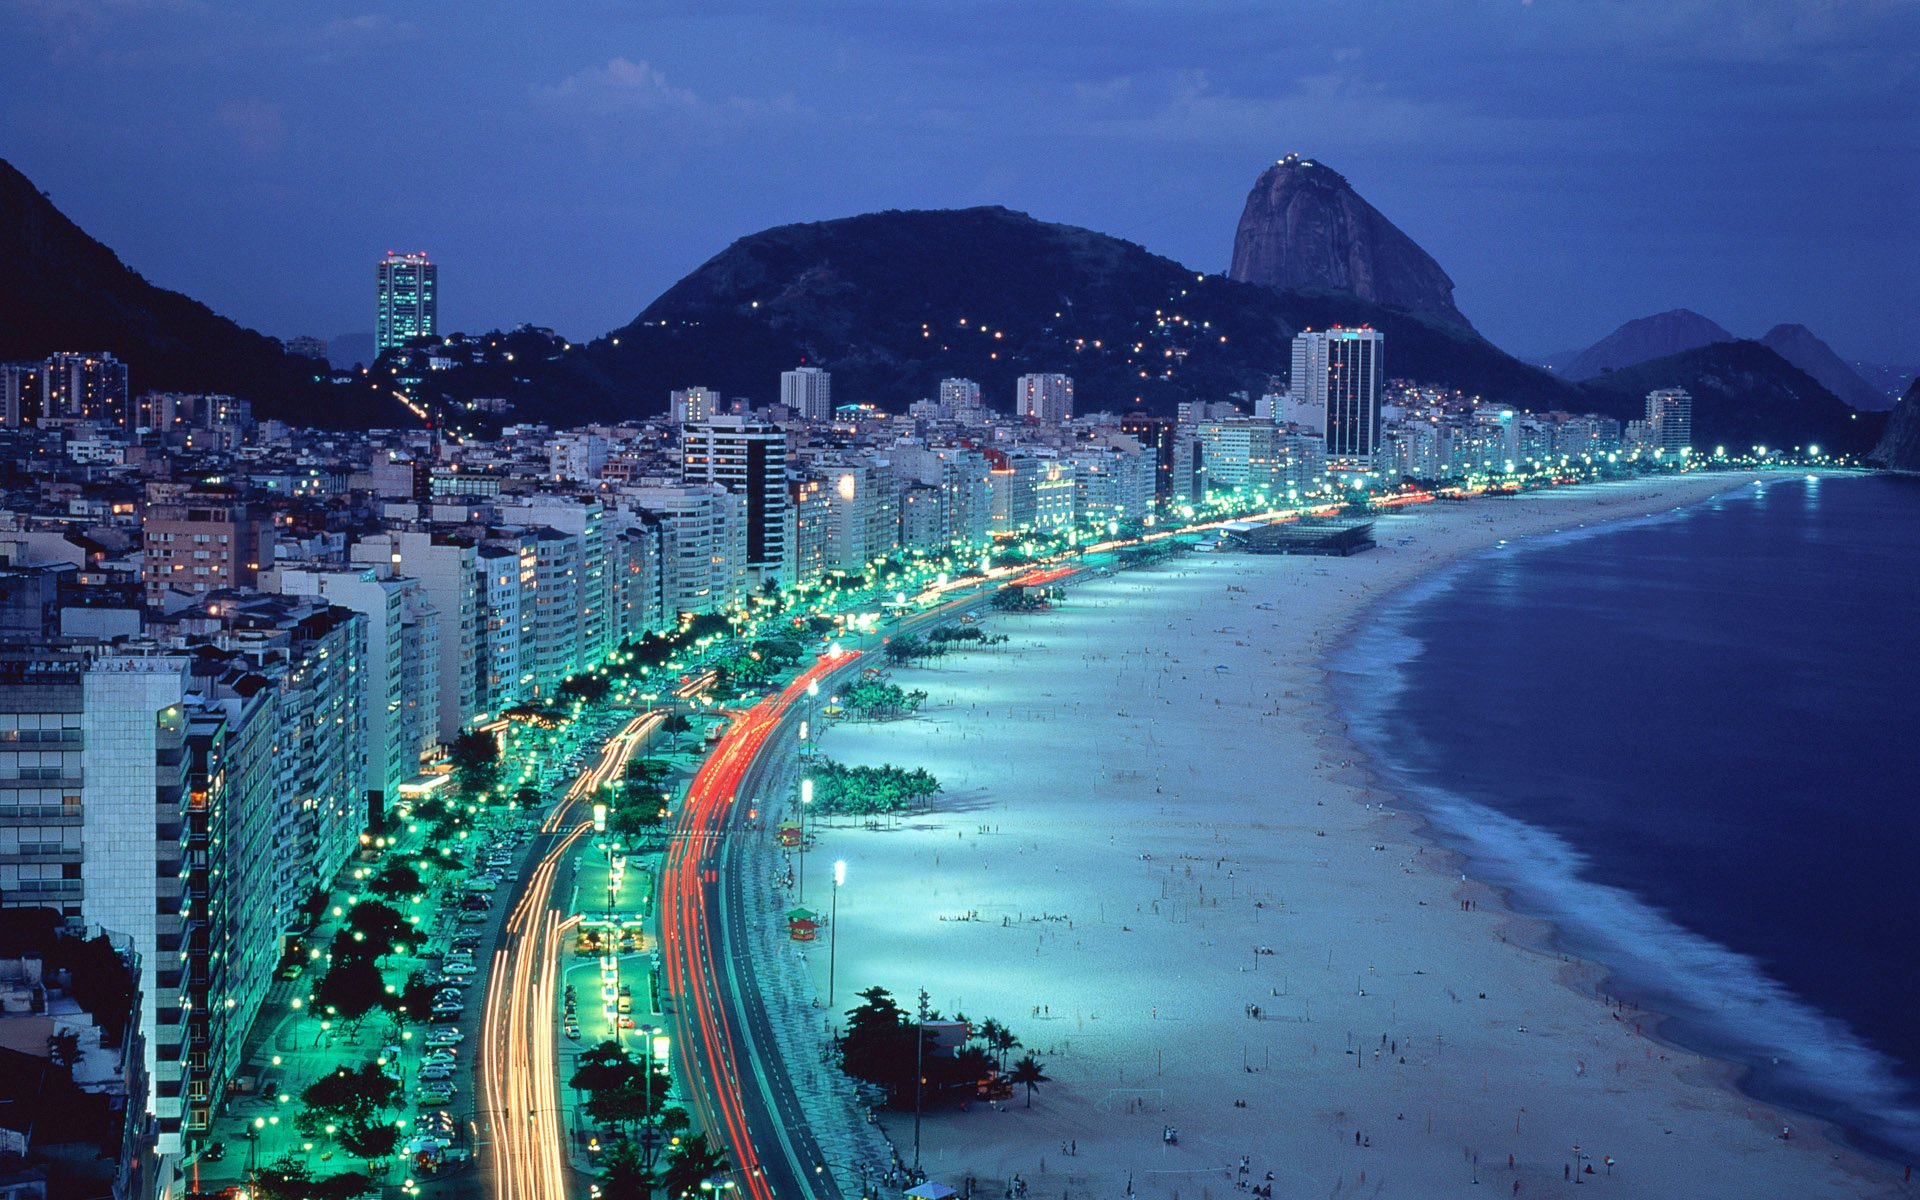 Brazil Desktop Wallpapers FREE on Latorocom 1920x1200